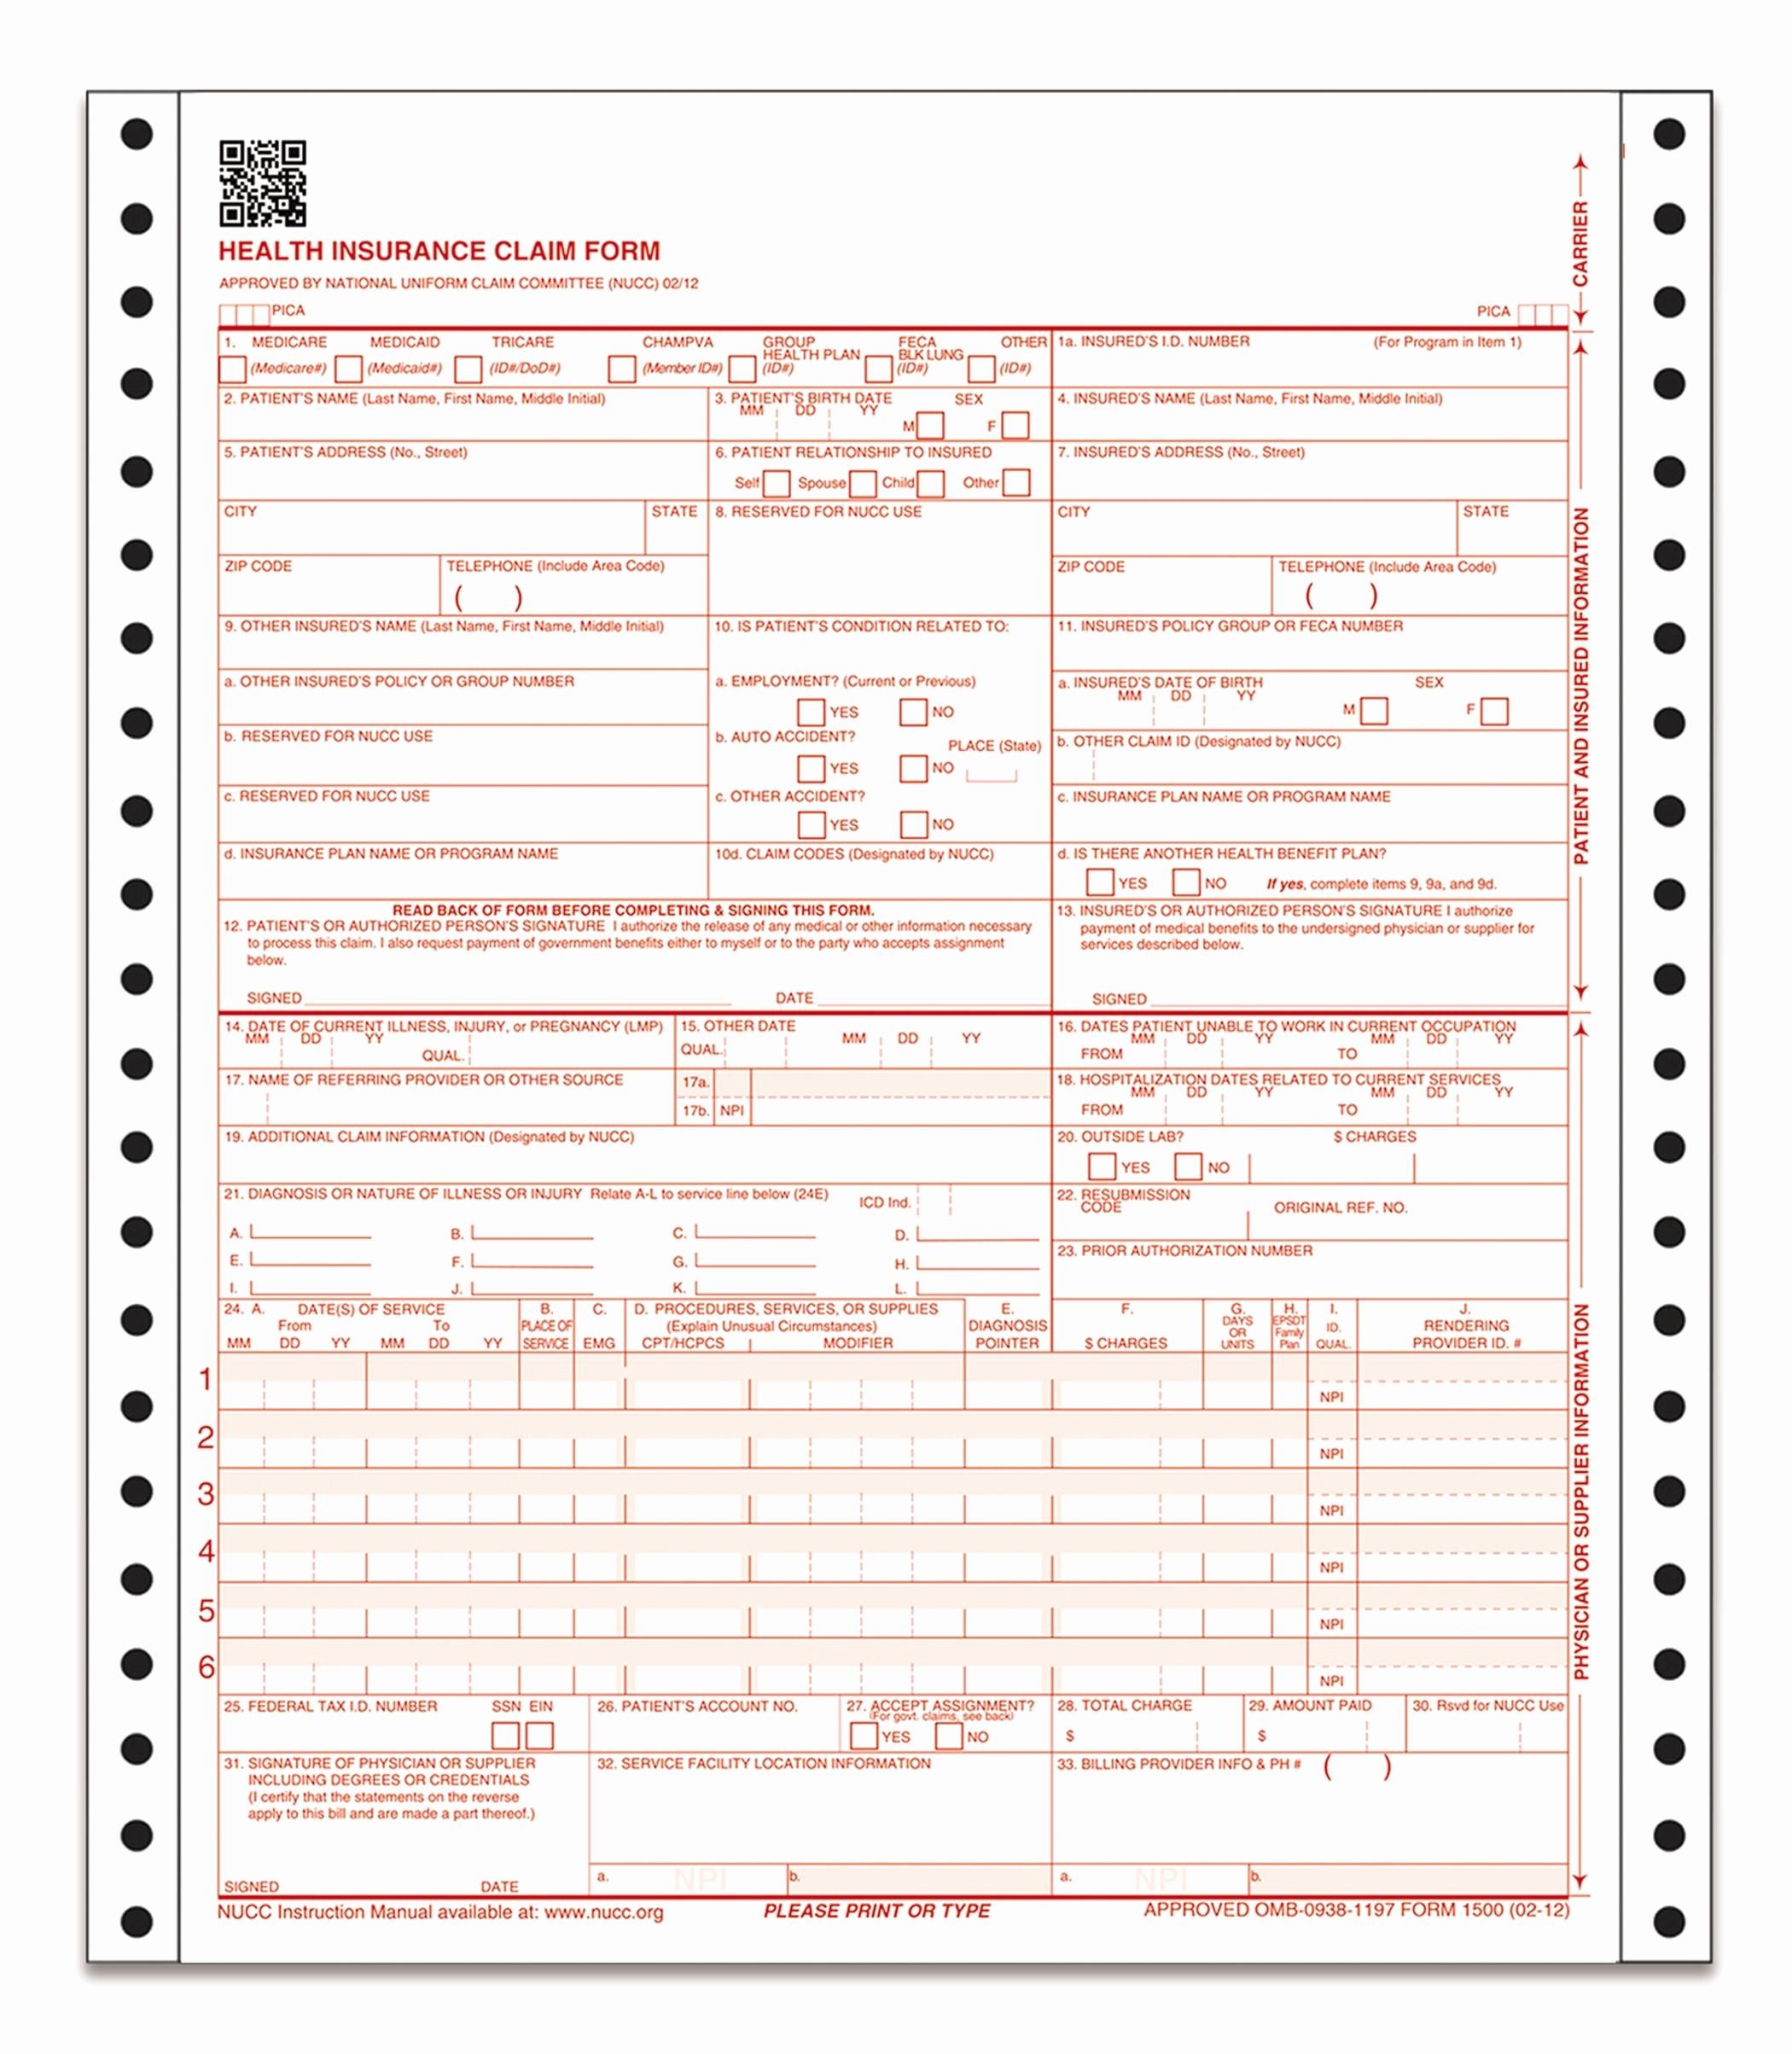 Www Pratcpasettlement Com Claim form Inspirational Health Insurance Claim form 2 Part Continuous 100 Sets